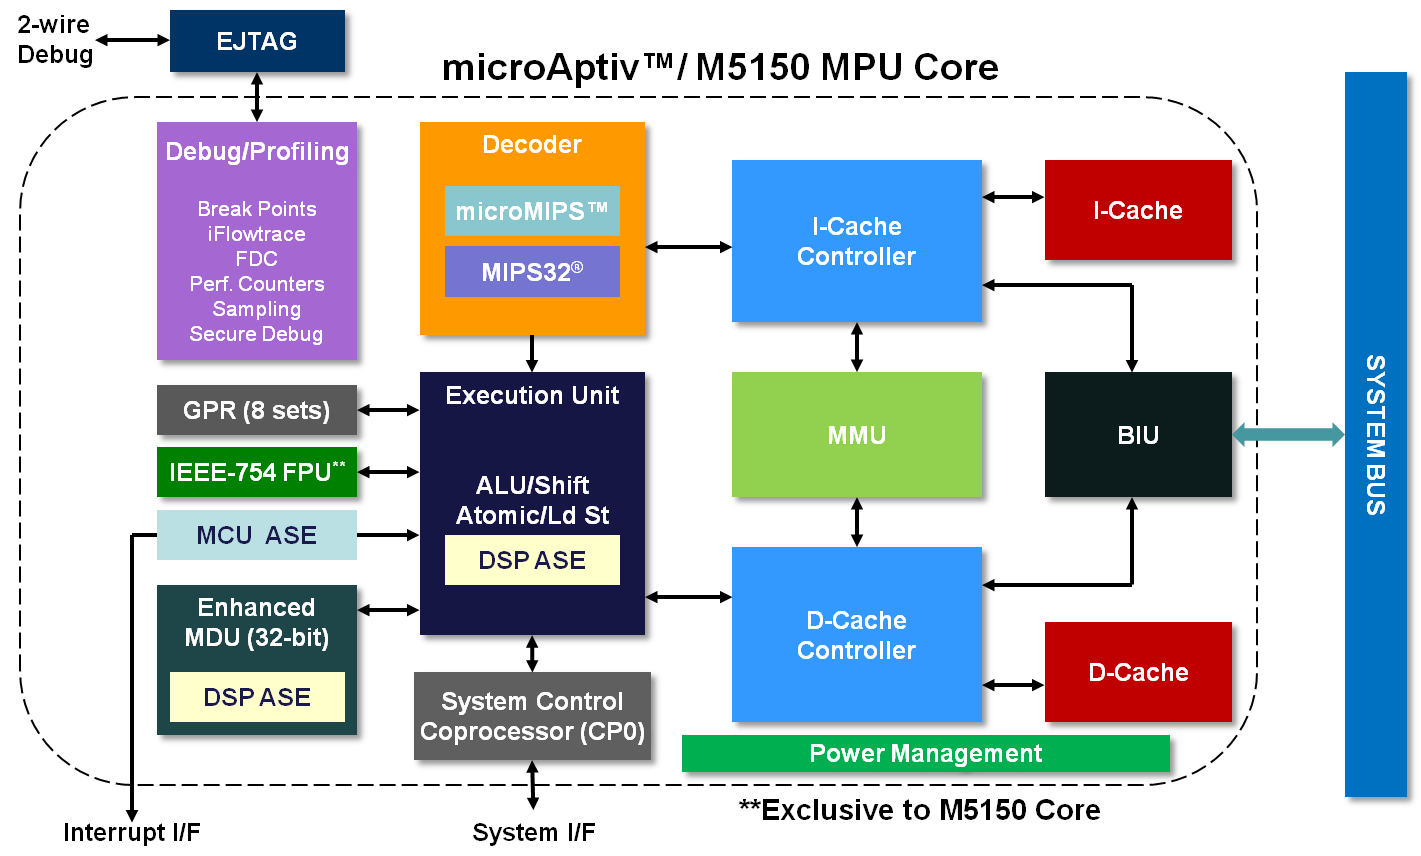 mpu-core-v2.png